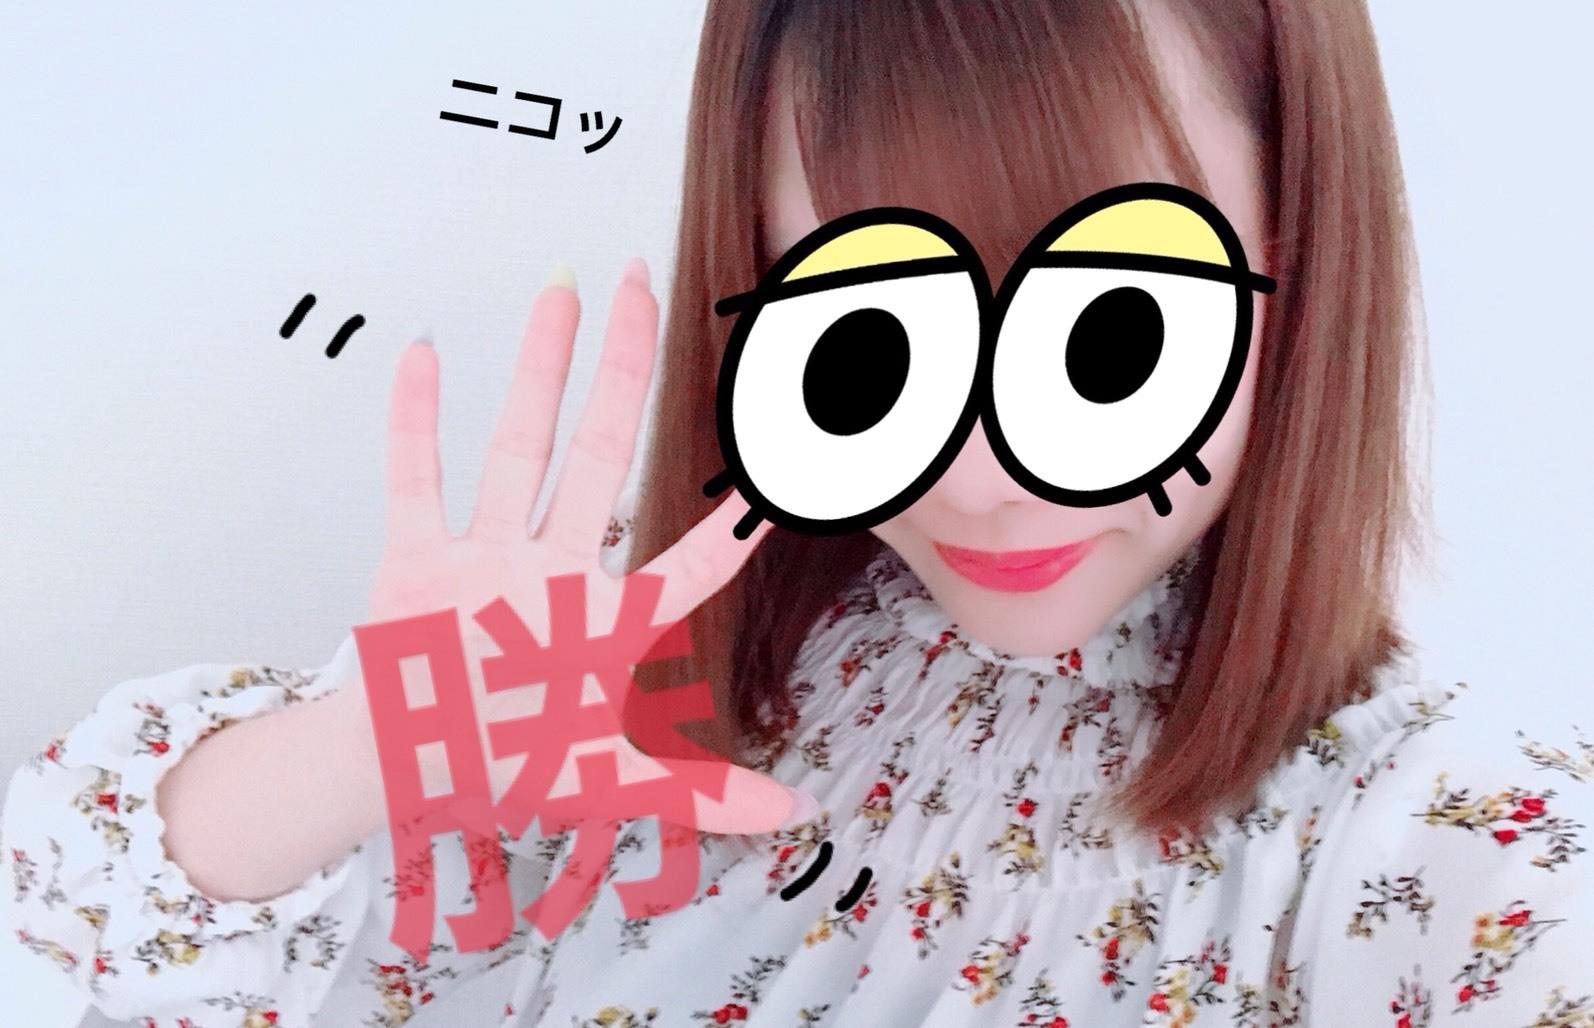 S__33980421.jpg